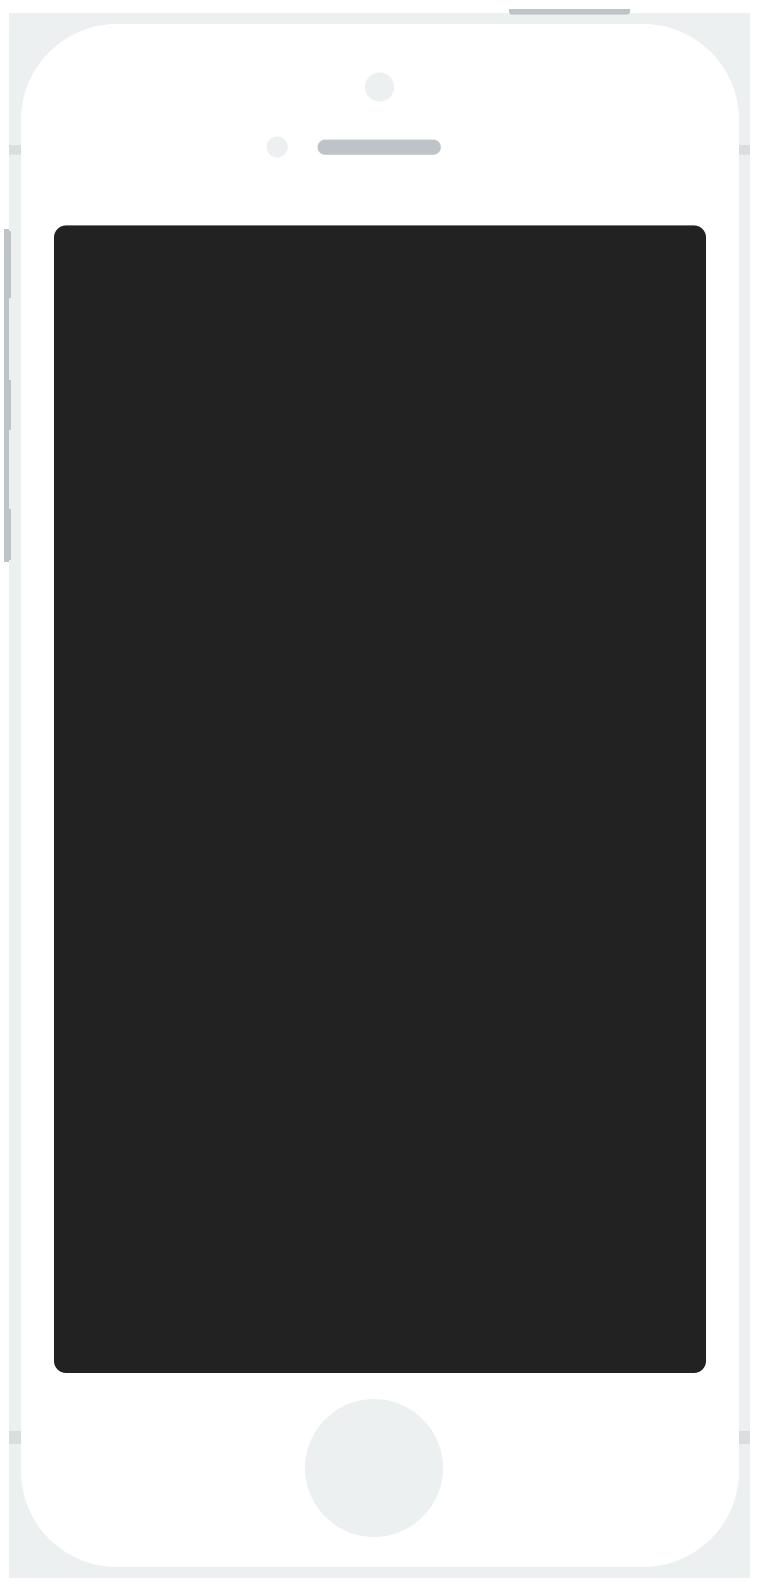 iphone background